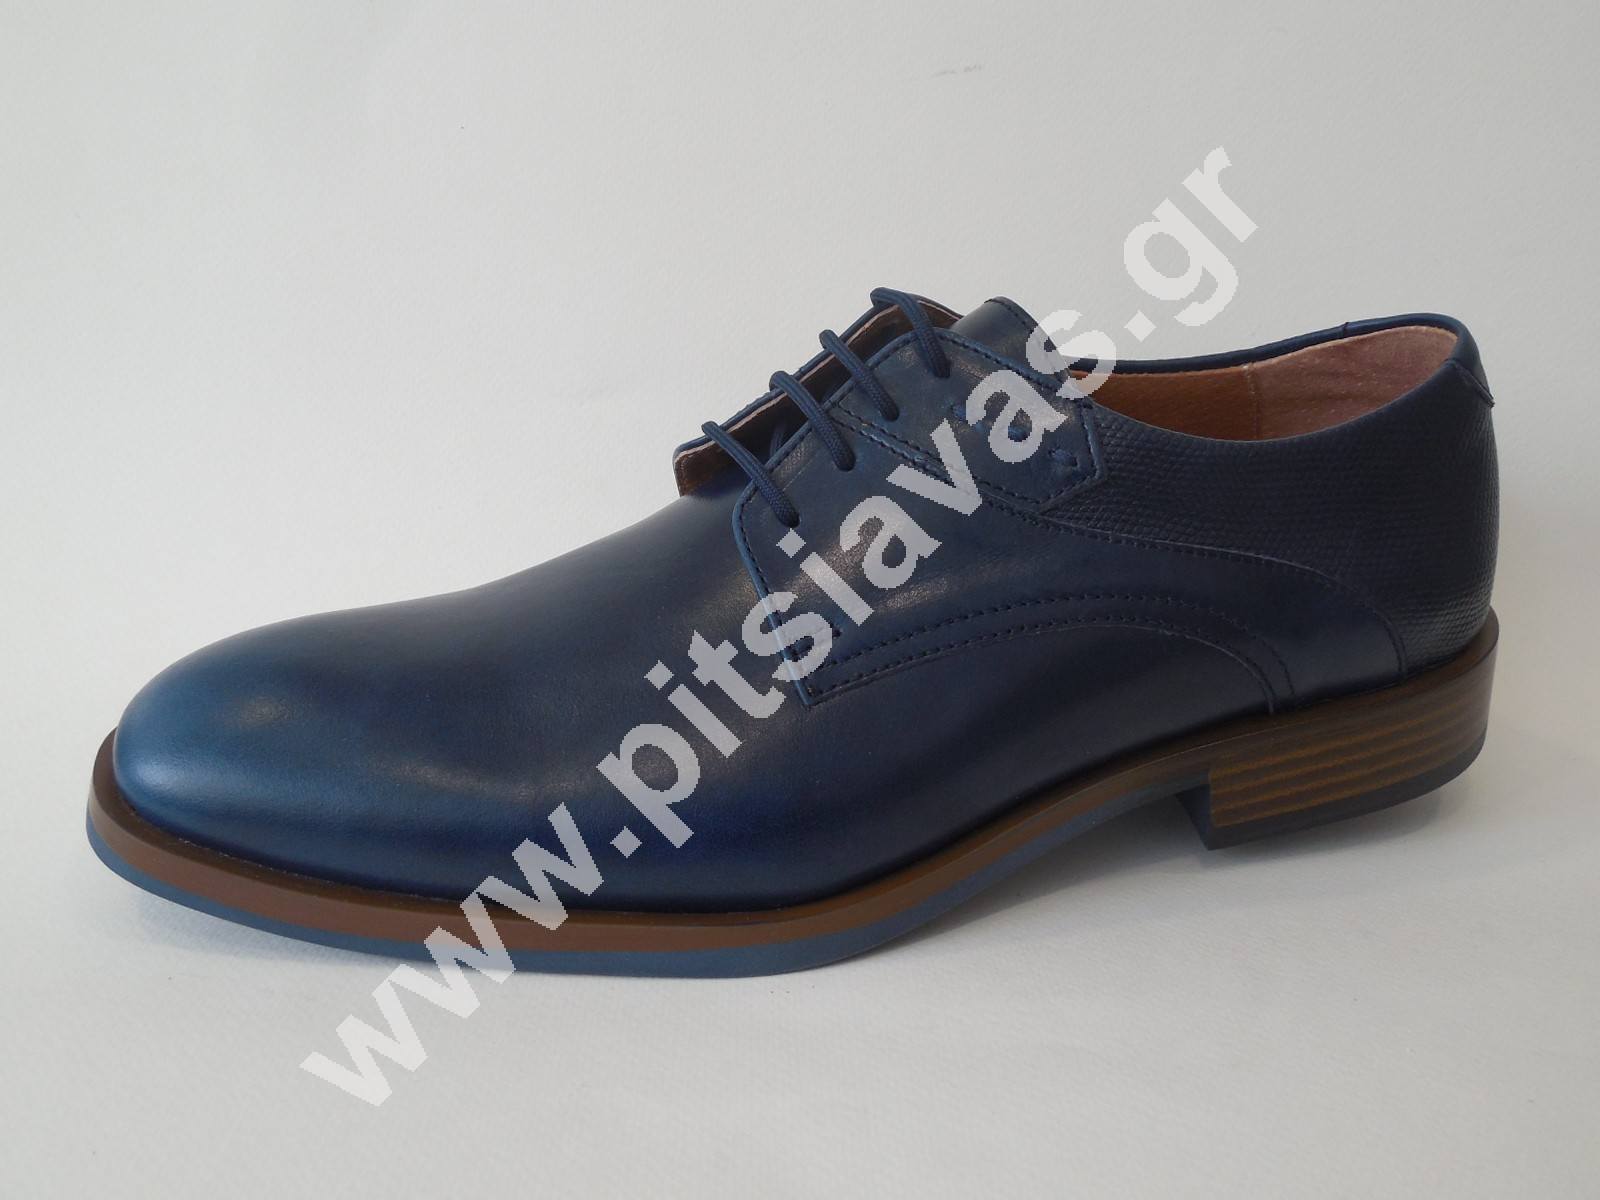 e61b49c02ff Commanchero ανδρικό παπούτσι 91663 μπλε δέρμα - pitsiavas